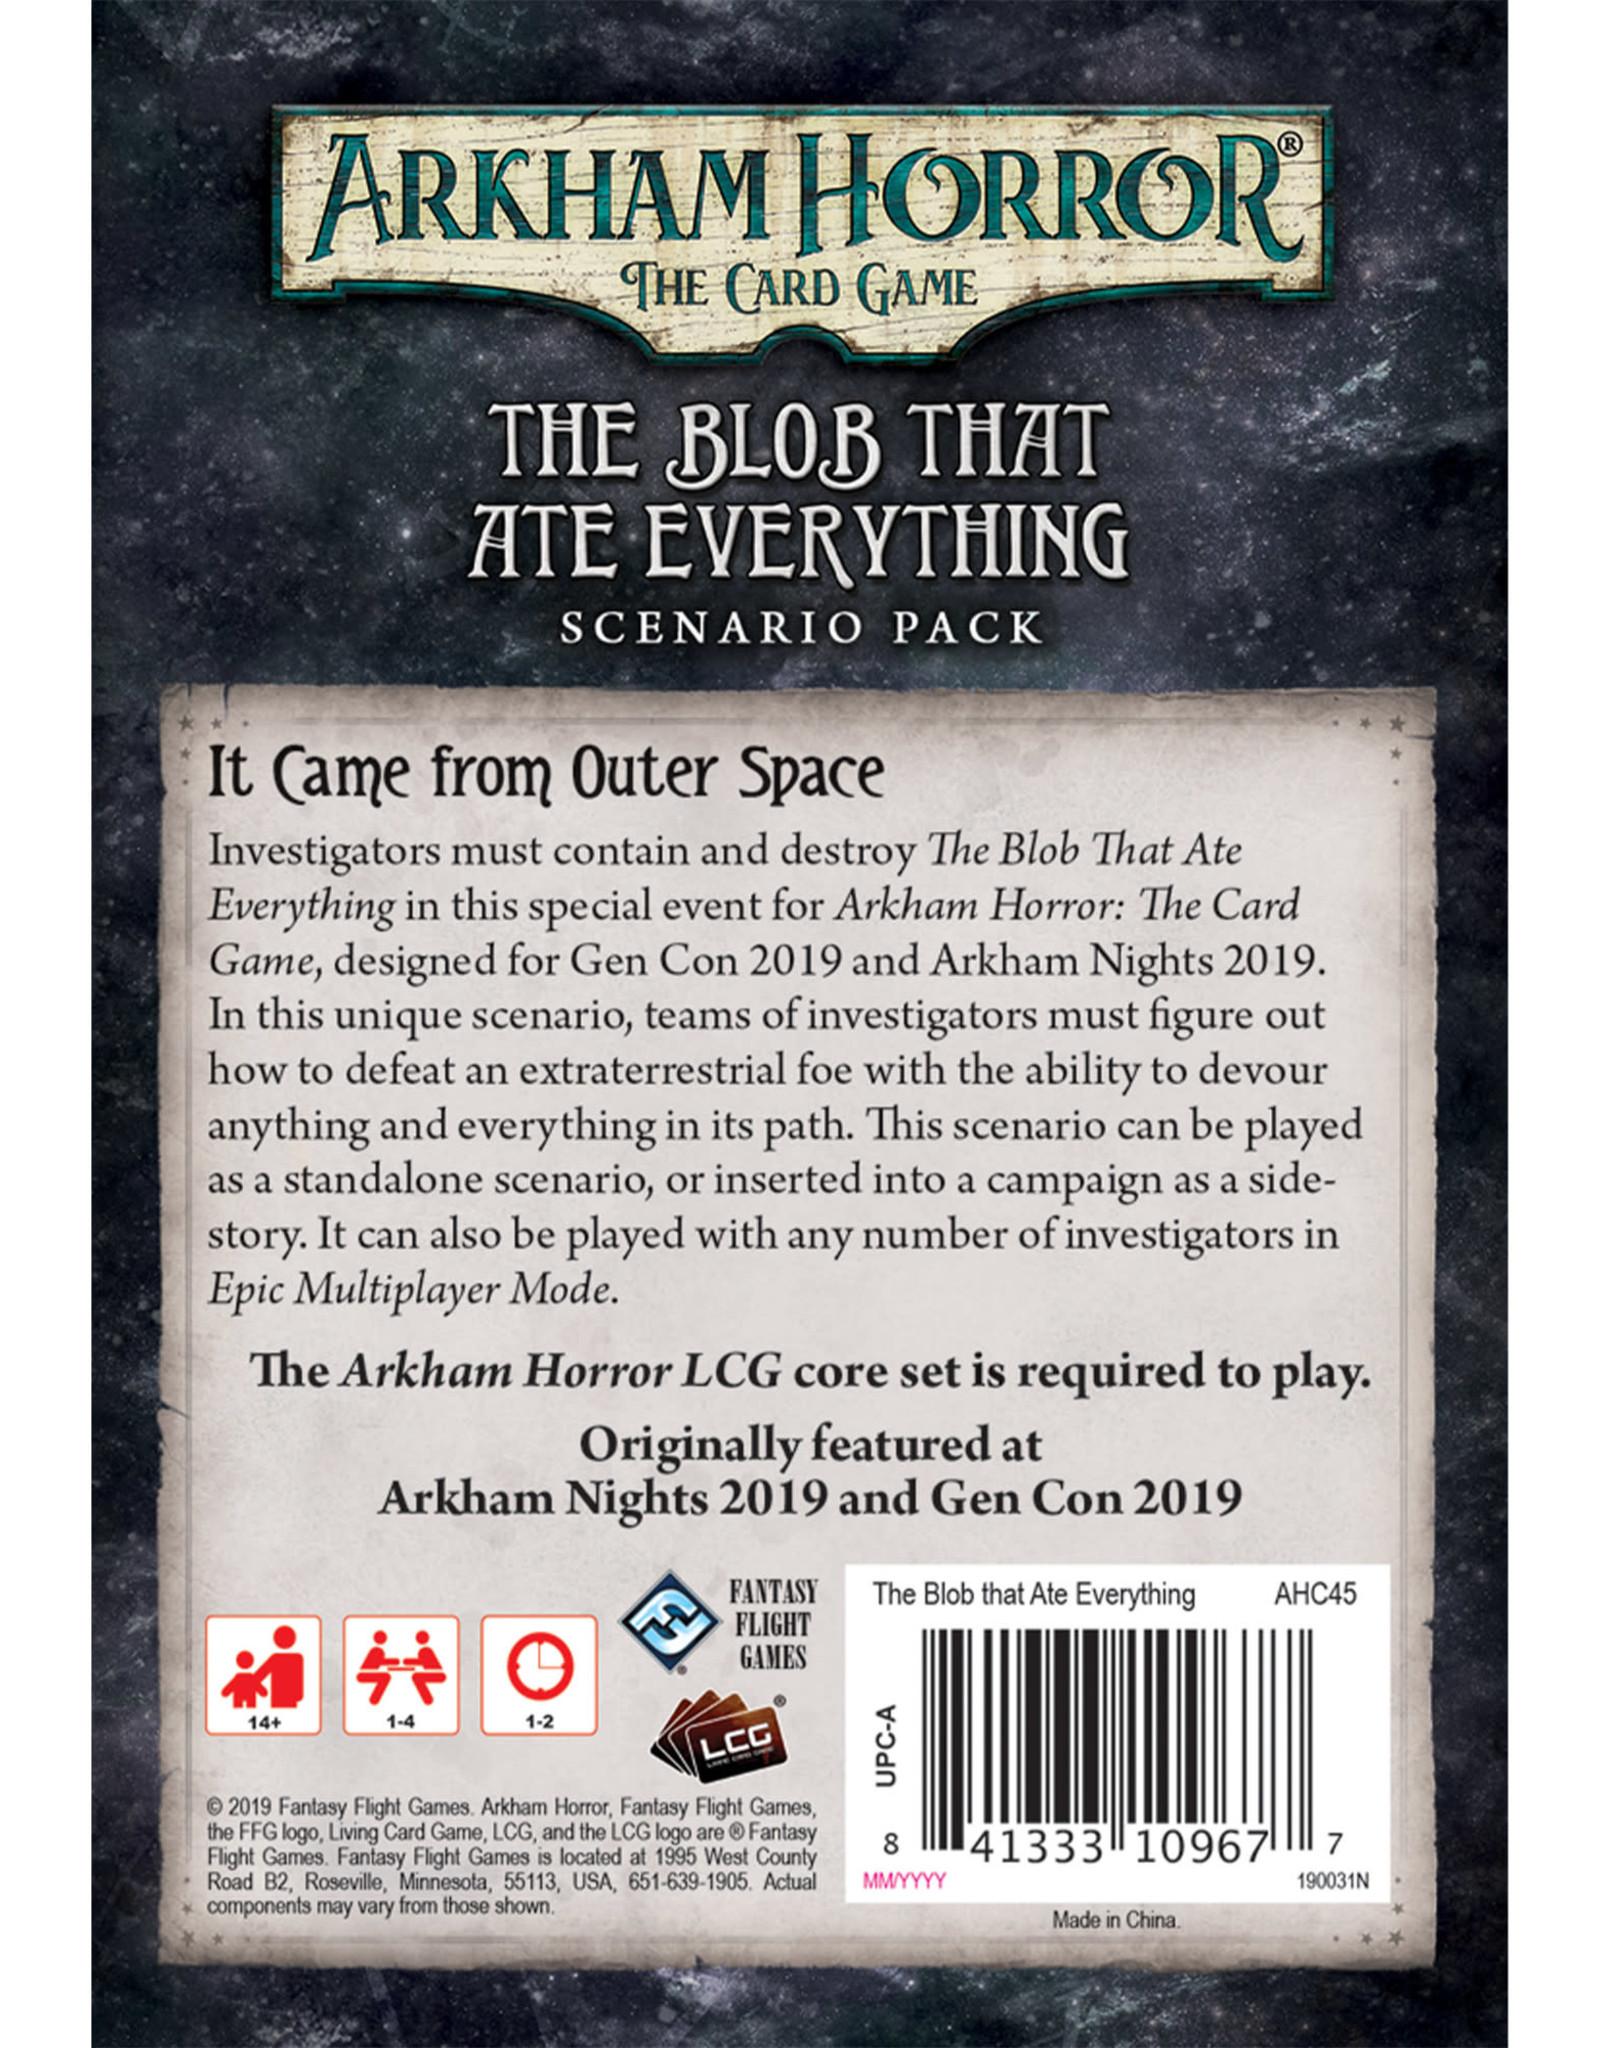 Arkham Horror LCG: The Blob That Ate Everything Scenario Pack